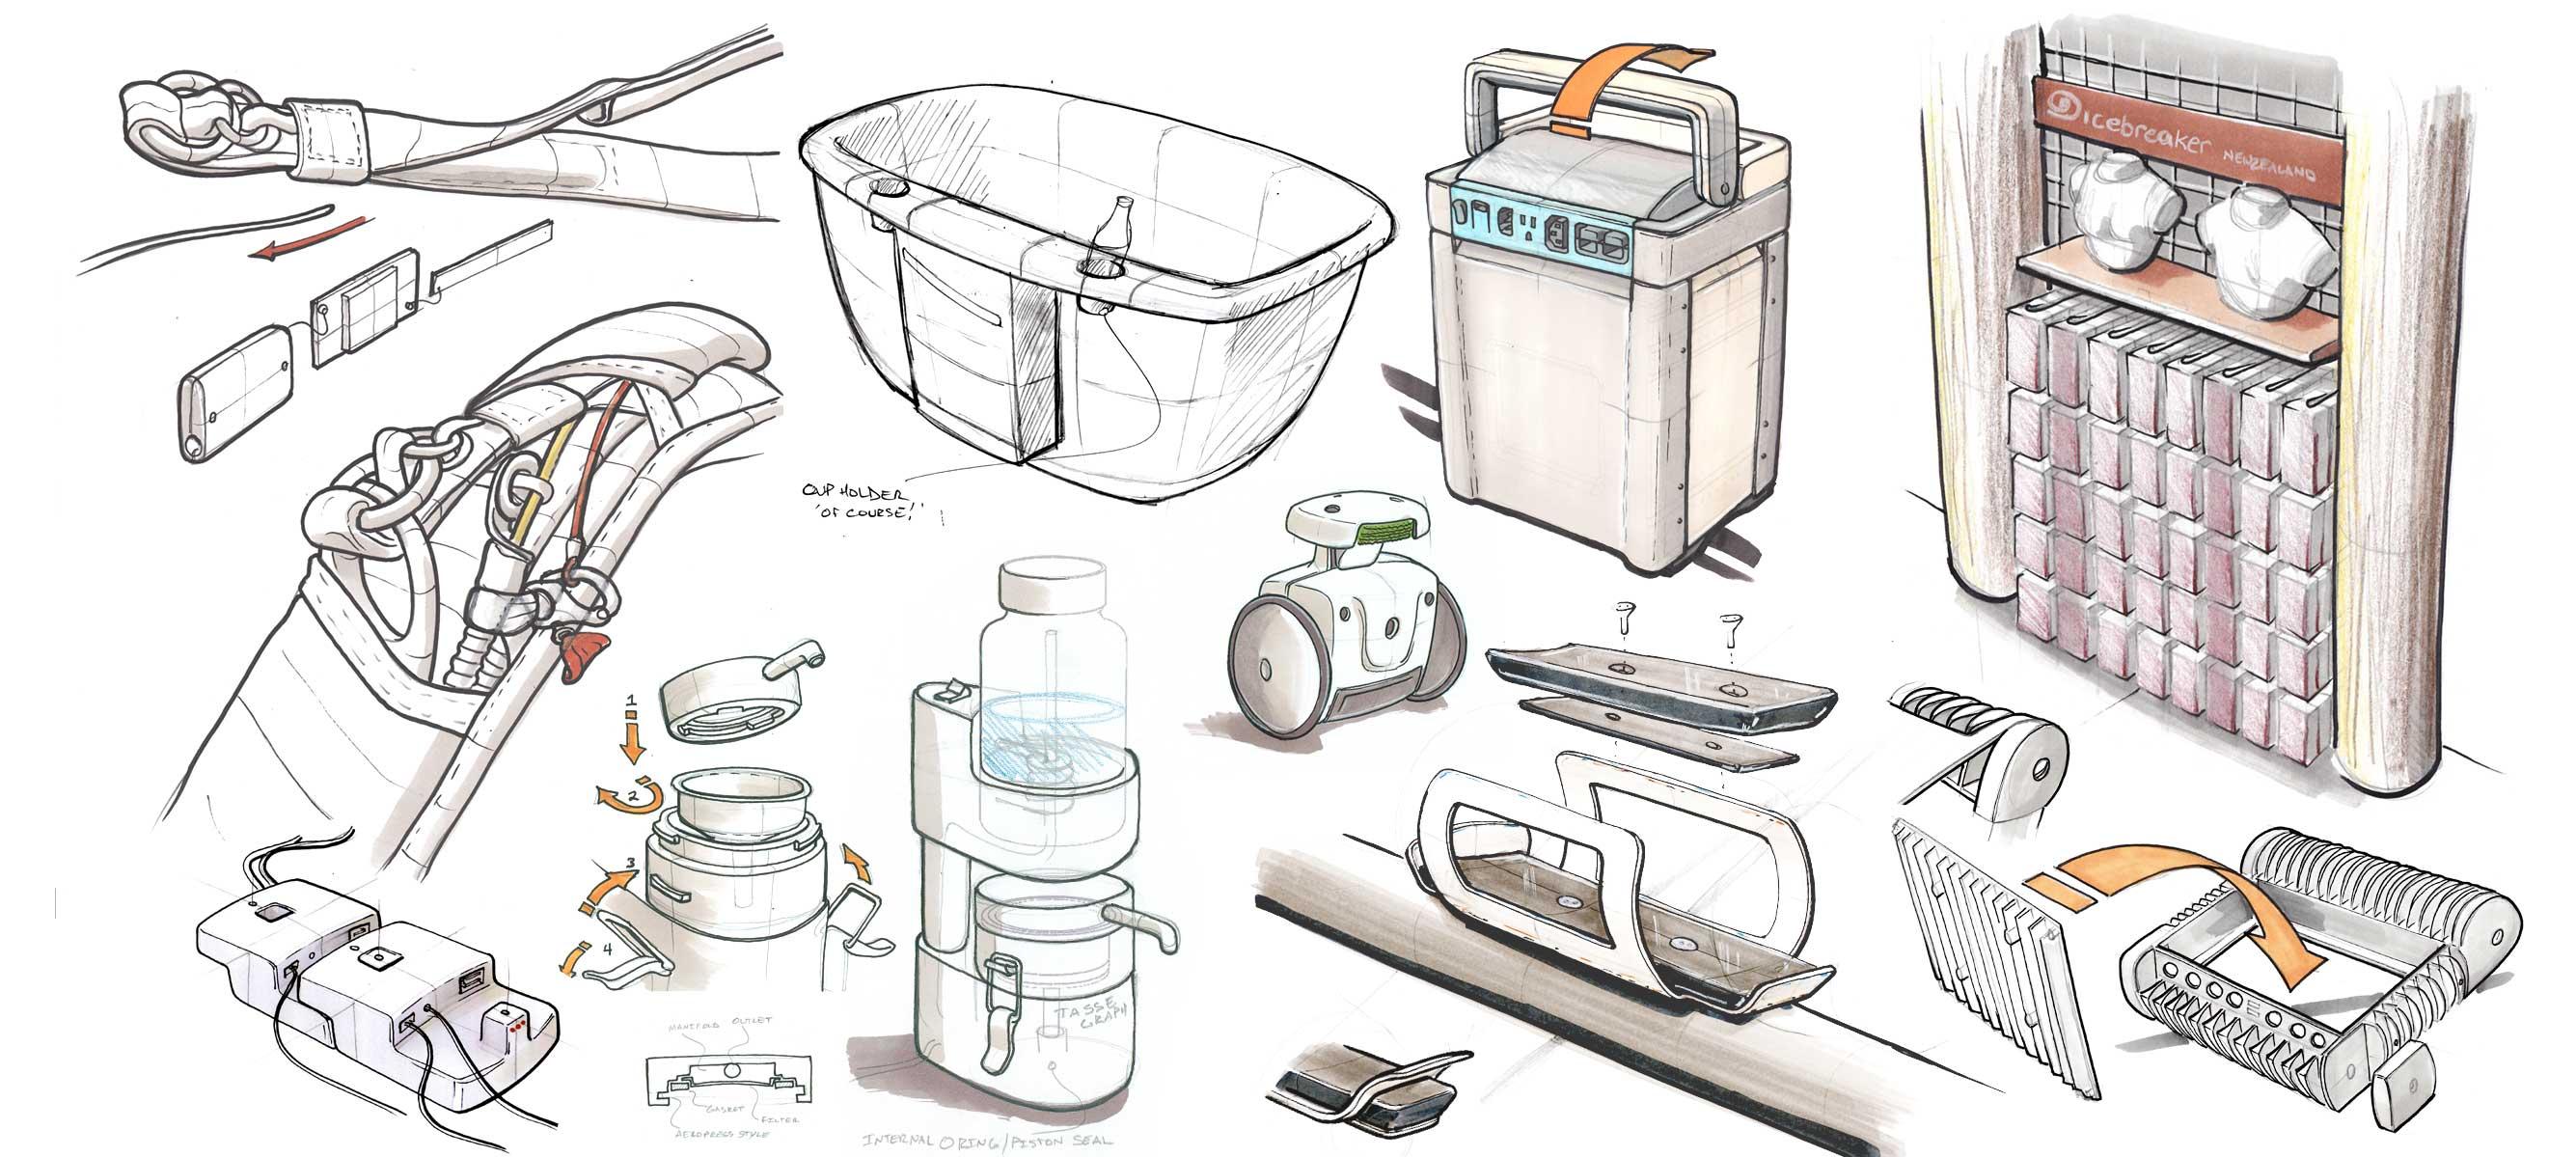 Industrial design product development creatid for Industrial design product development